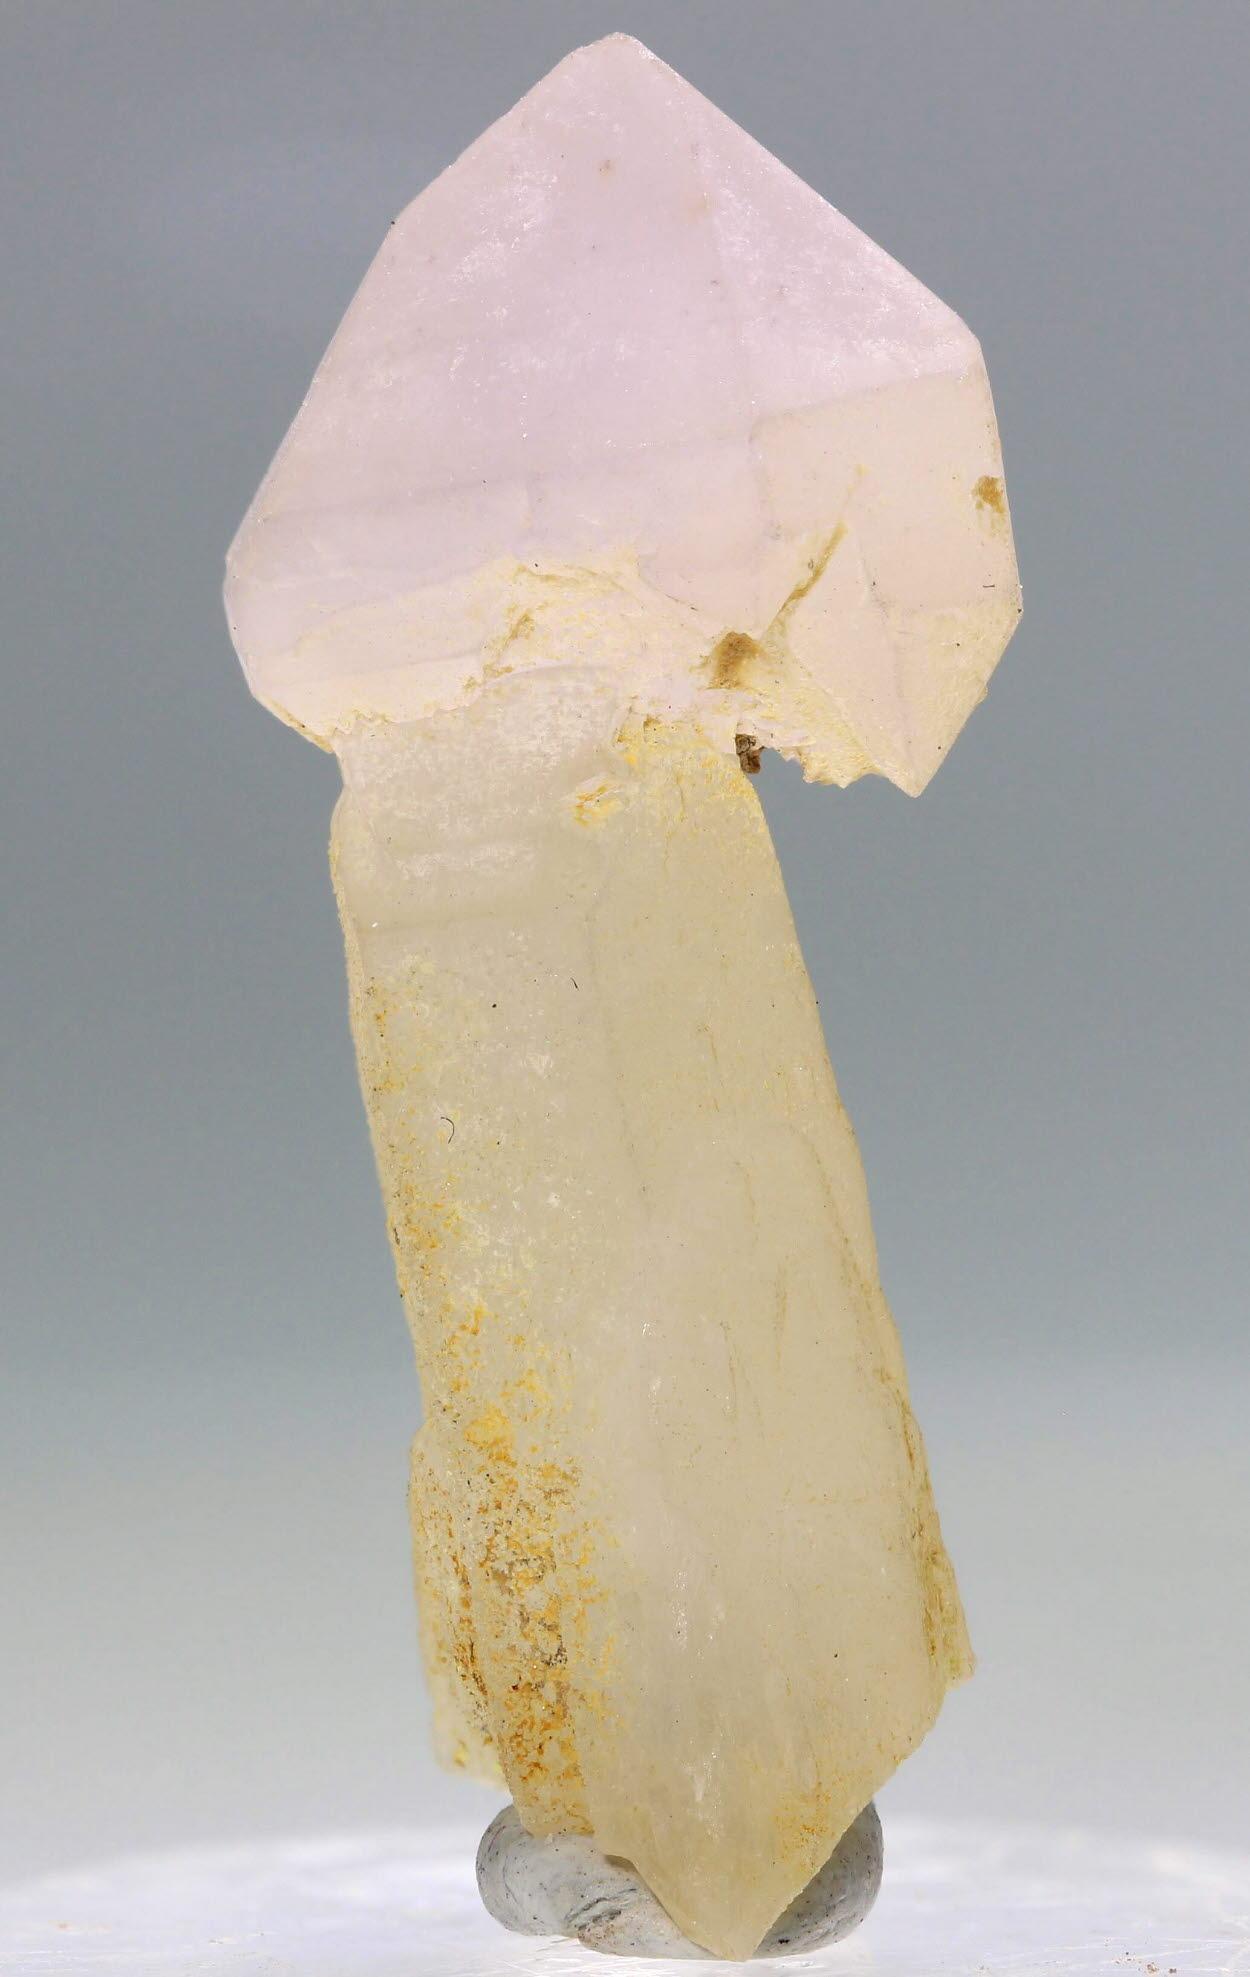 Amethyst Sceptre On Quartz